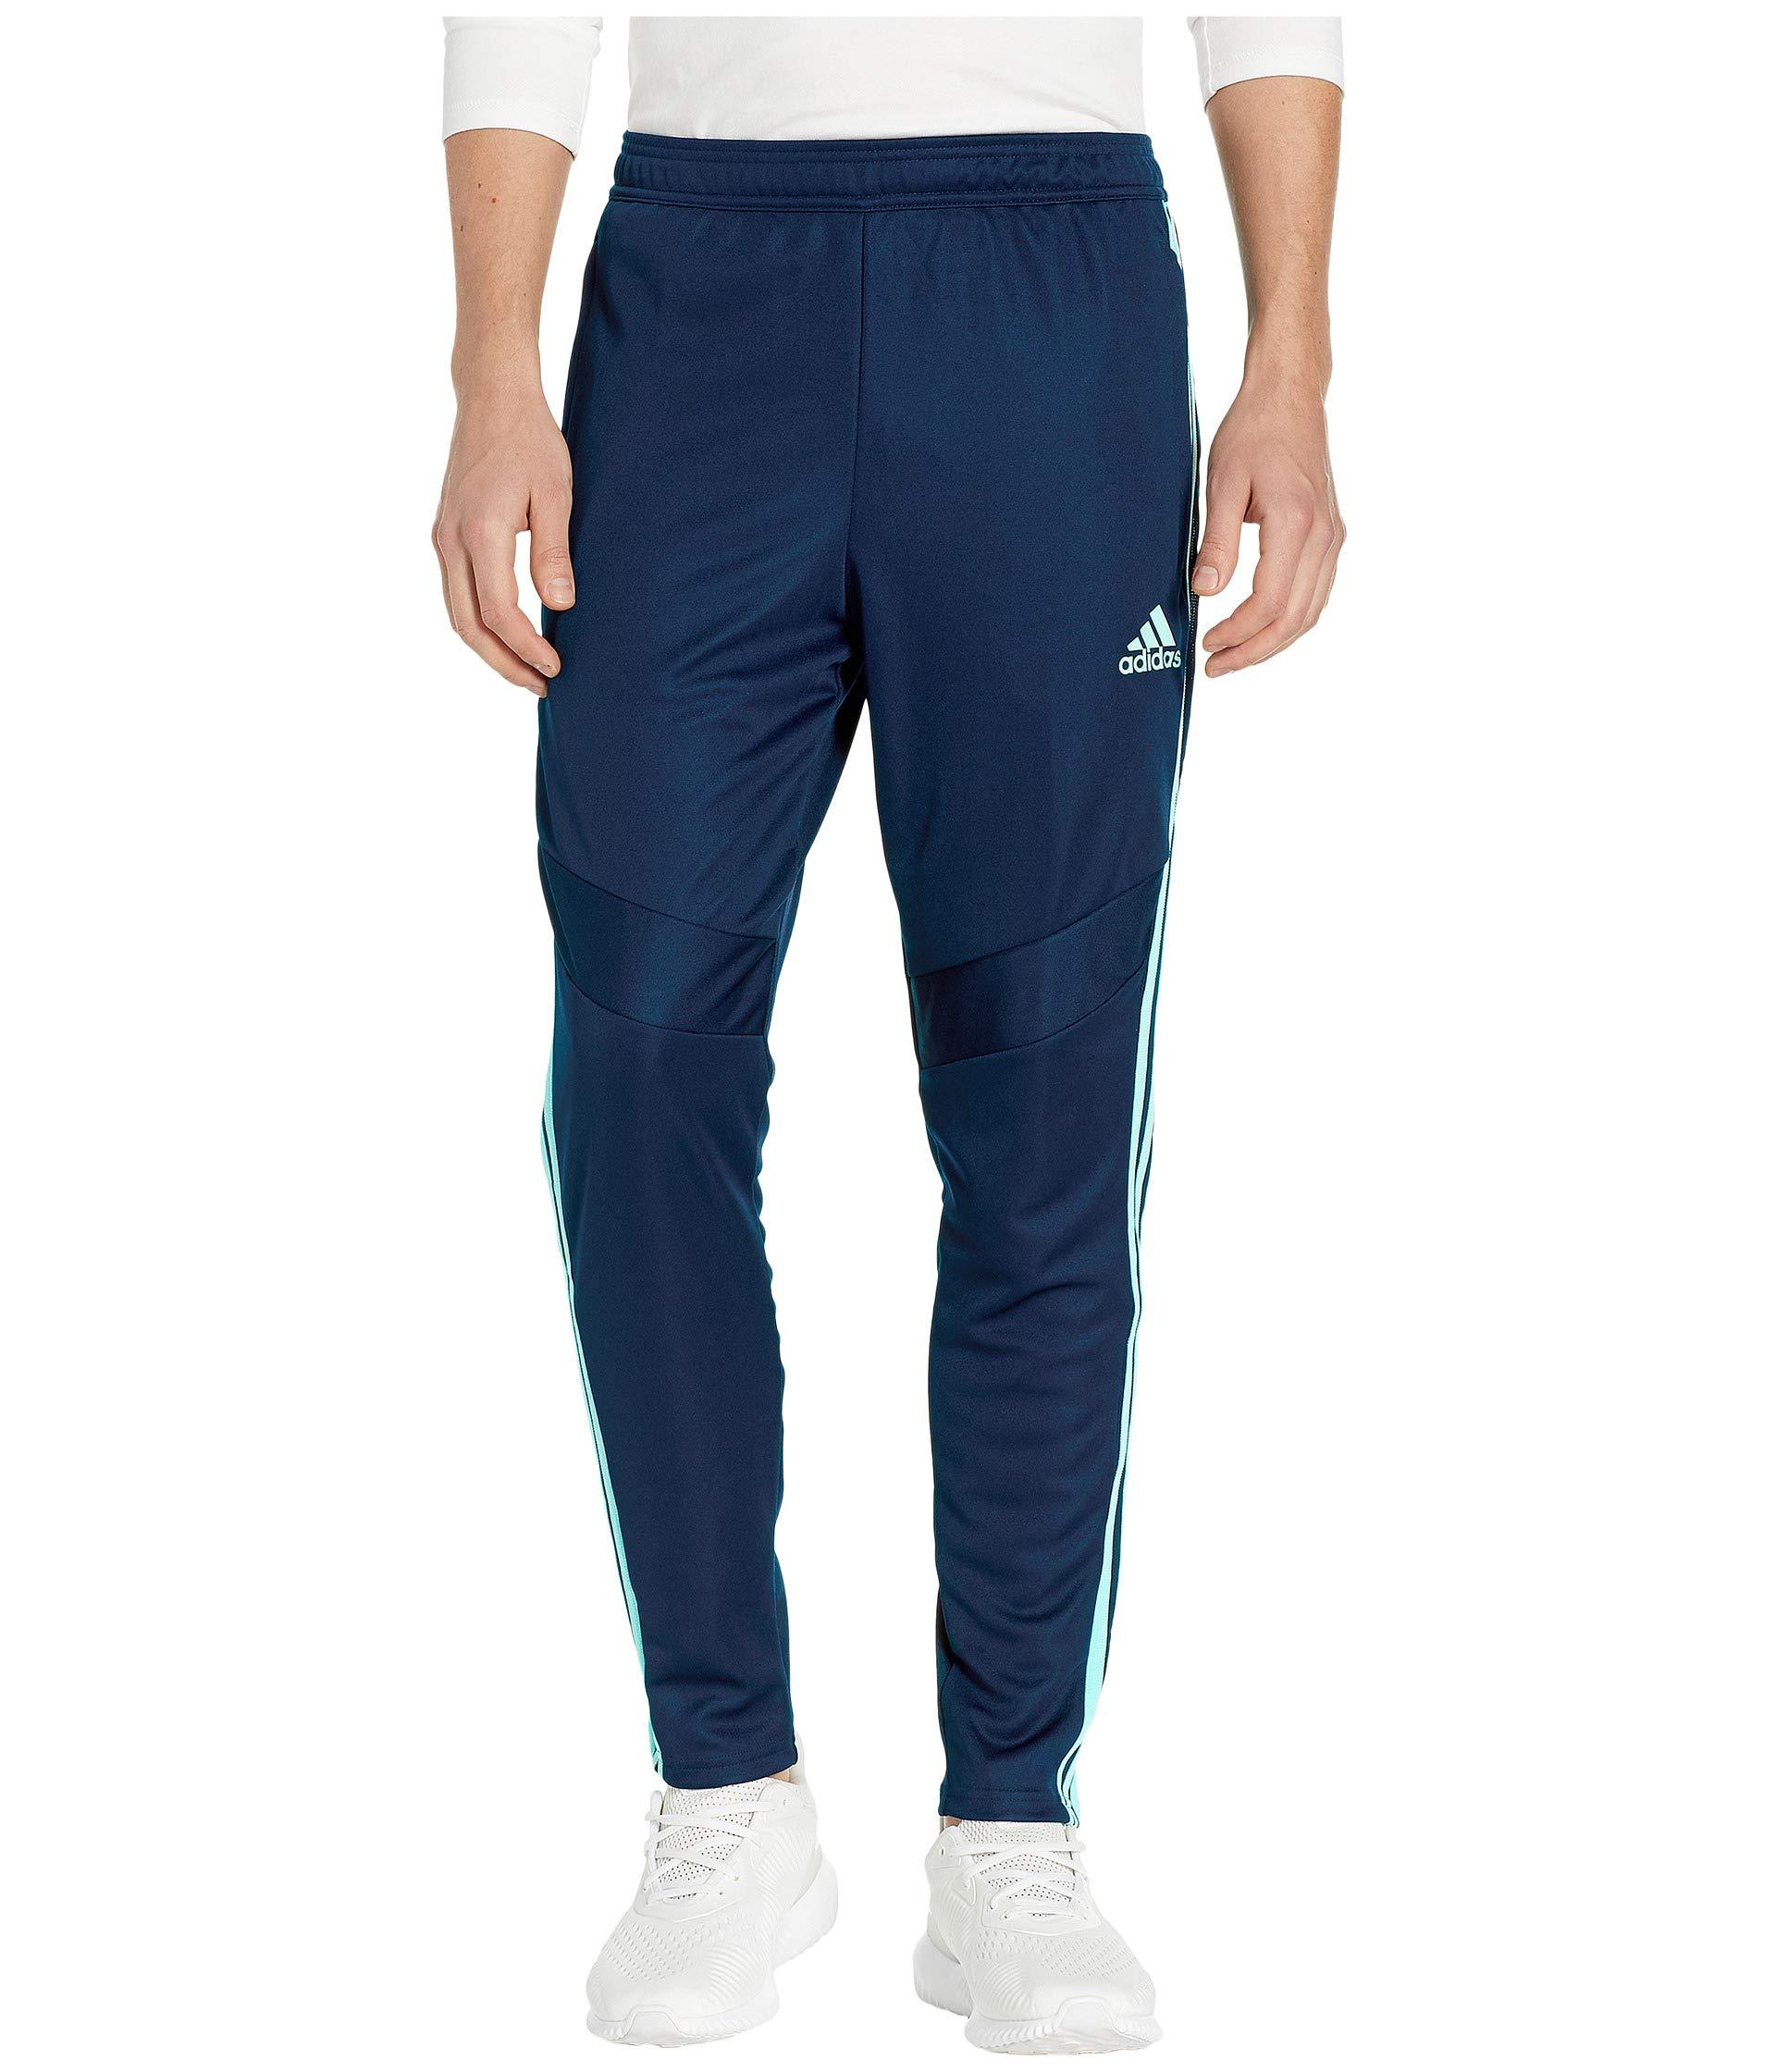 adidas Tiro '19 Pants Collegiate Navy/Clear Mint XL